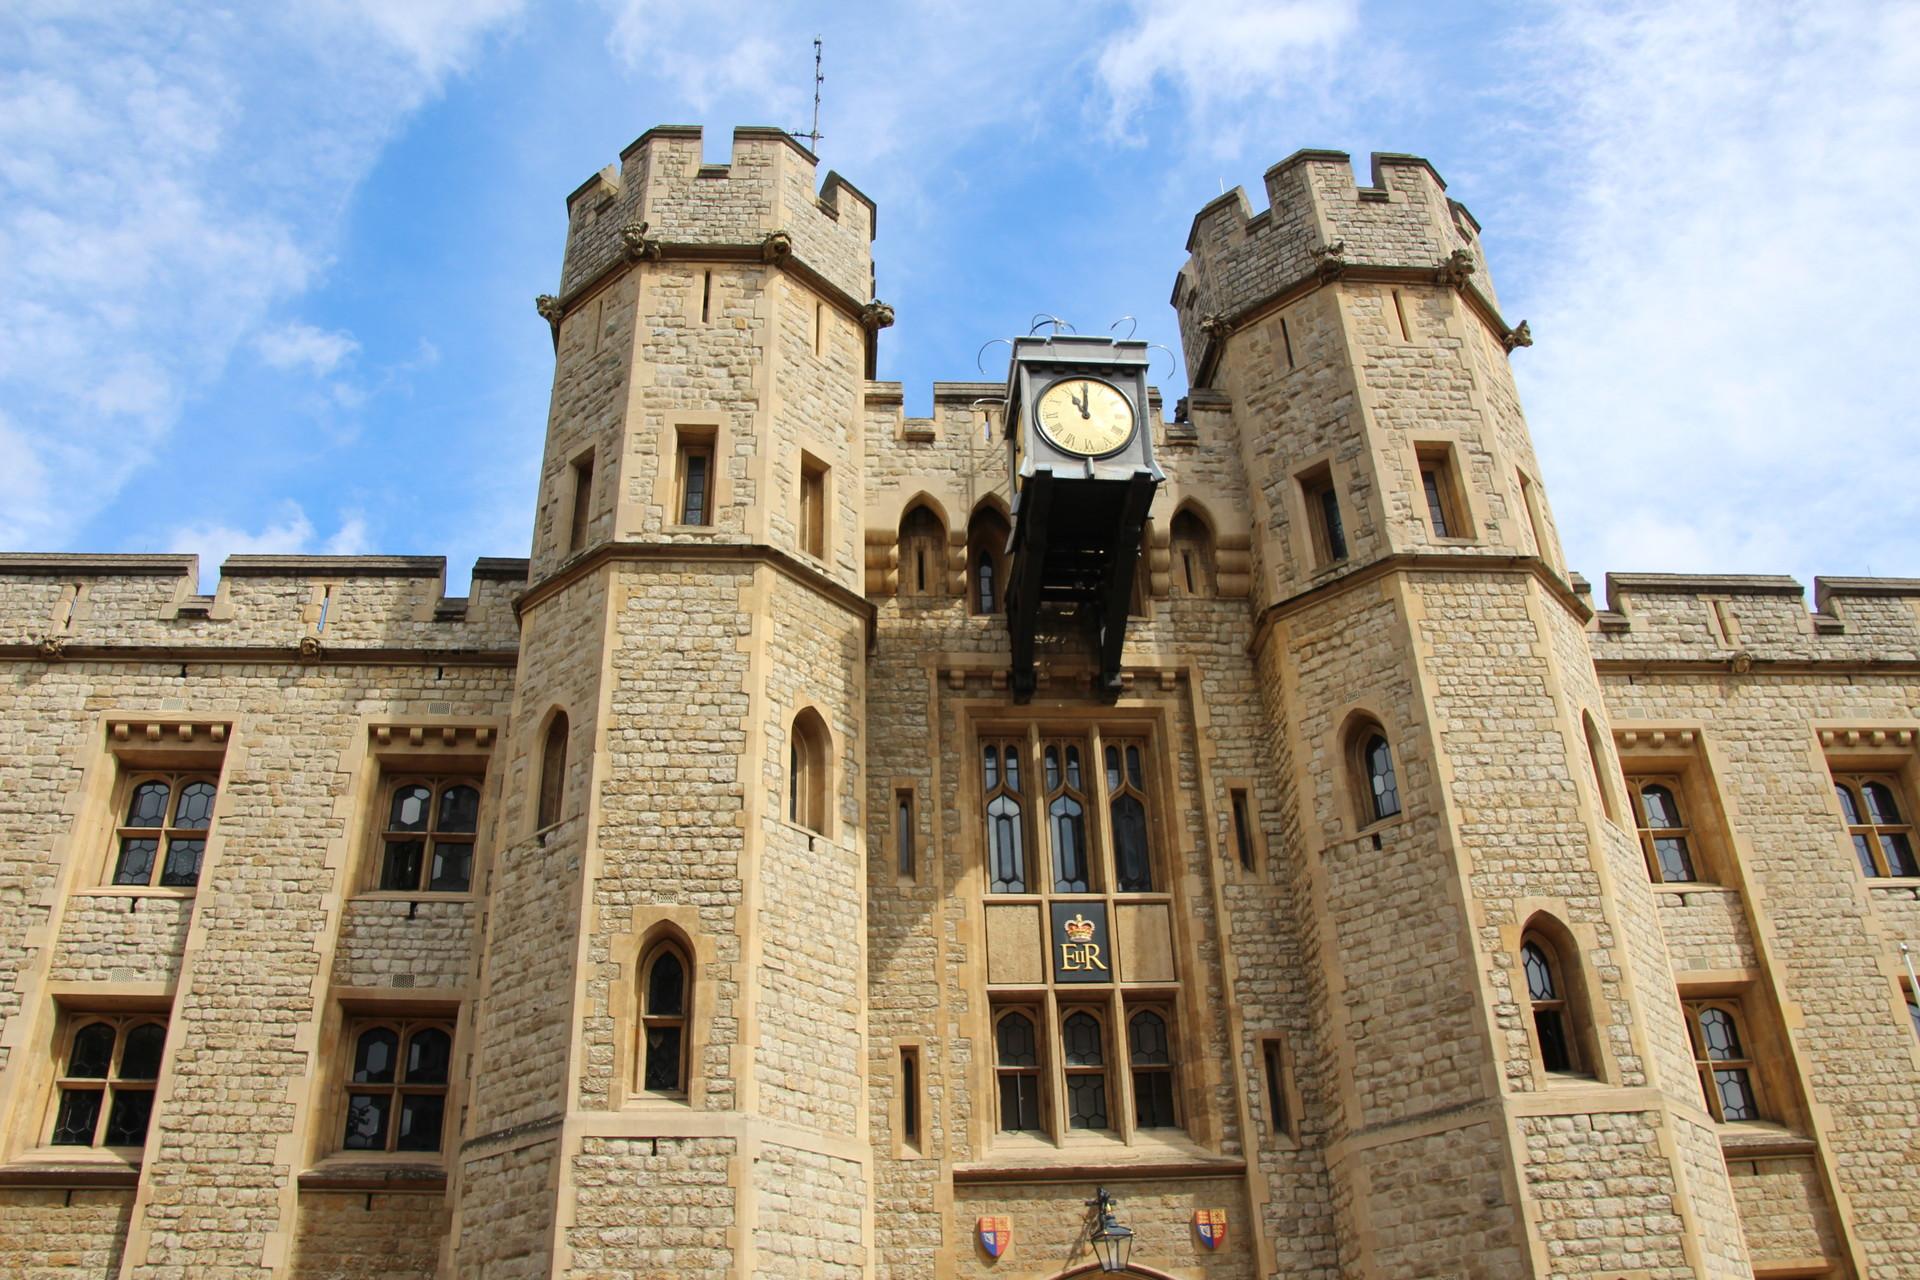 tower-of-london-la-torre-londres-4edab84